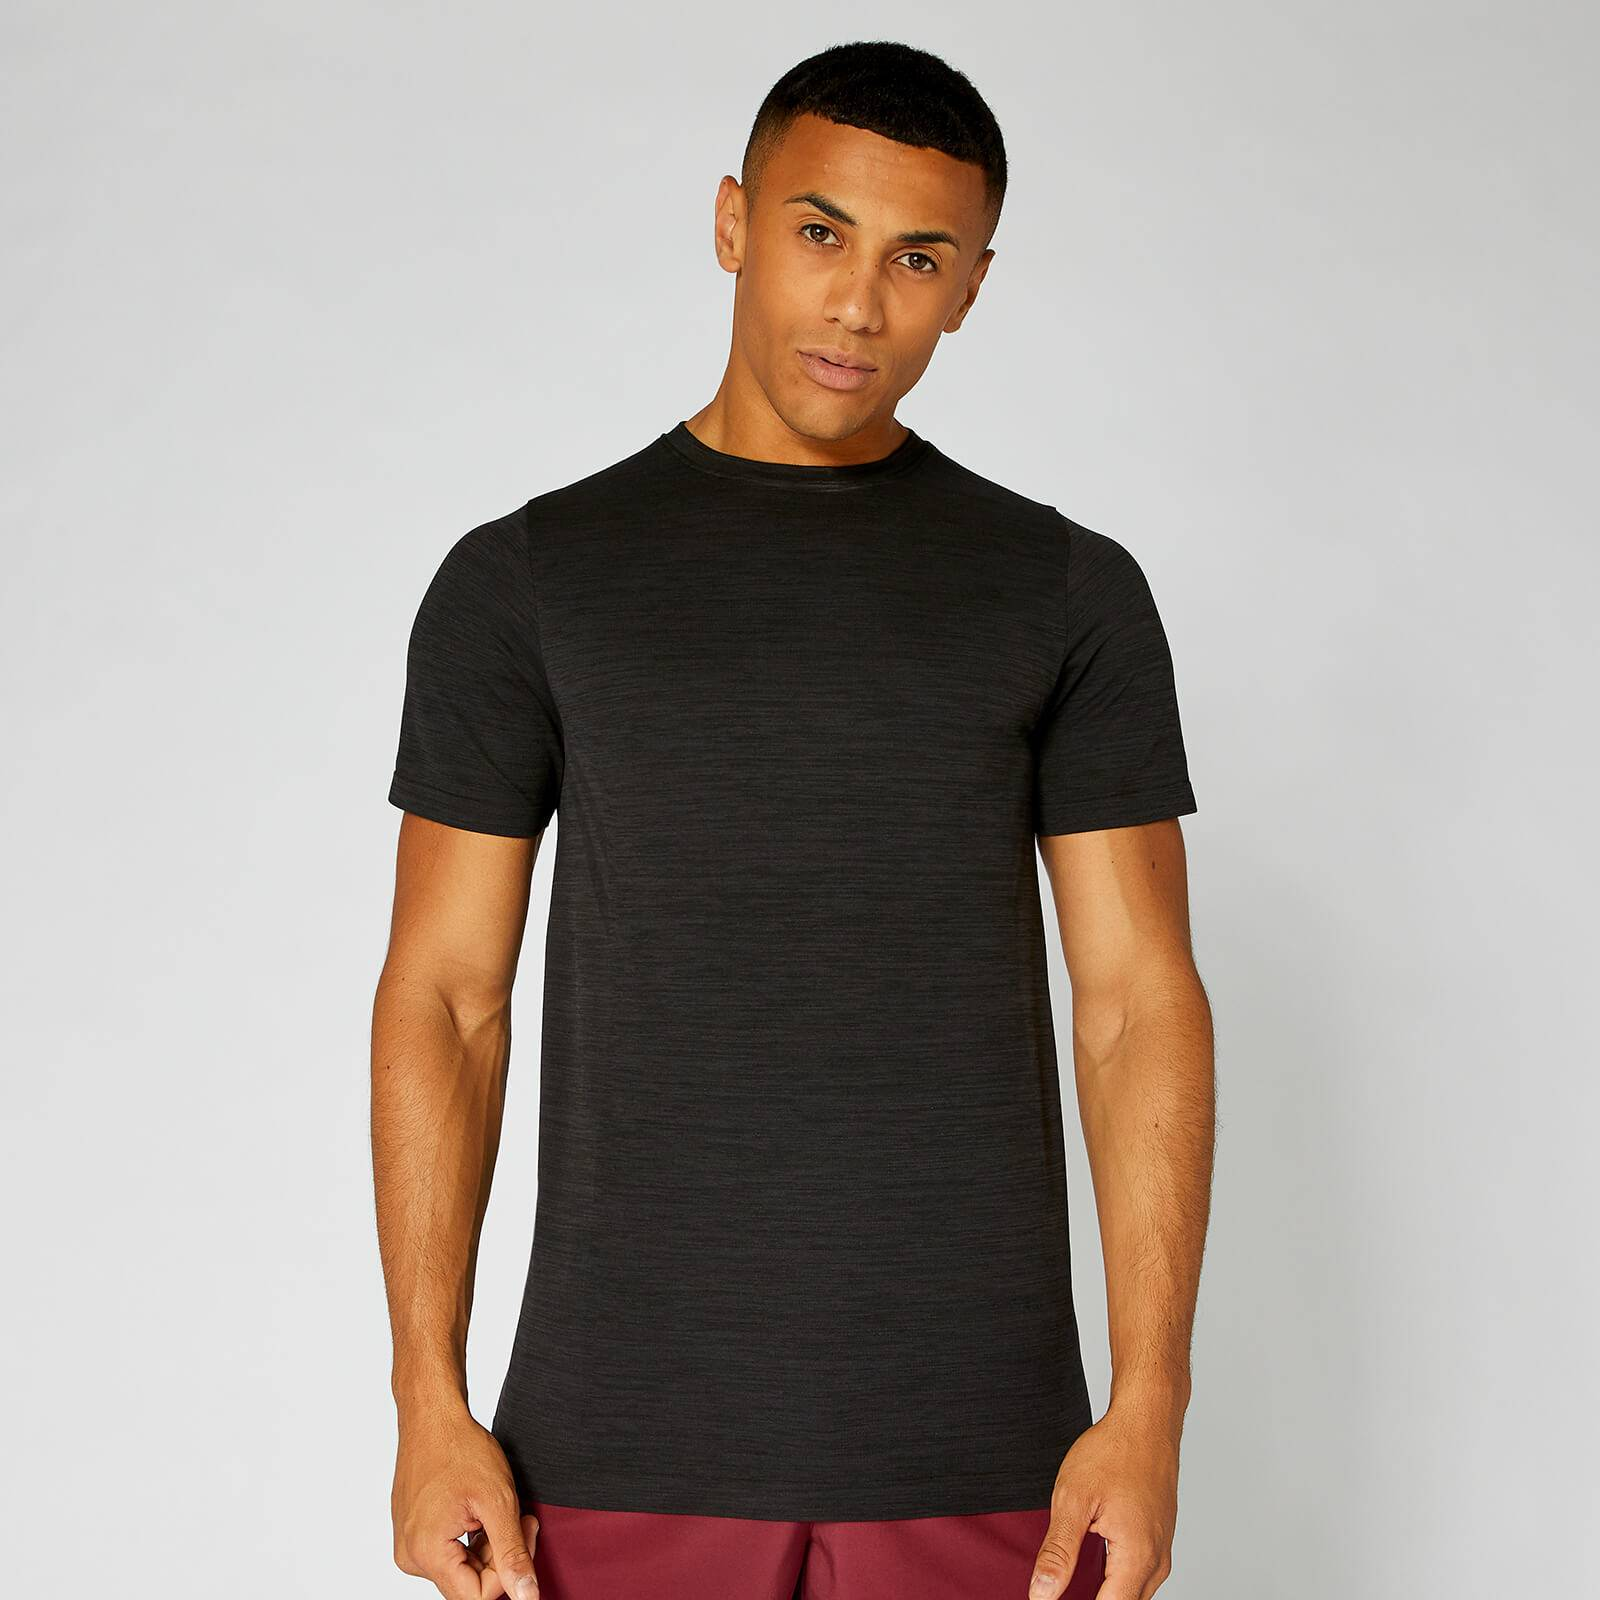 Myprotein Lightweight Seamless T-Shirt - Black Marl - XL